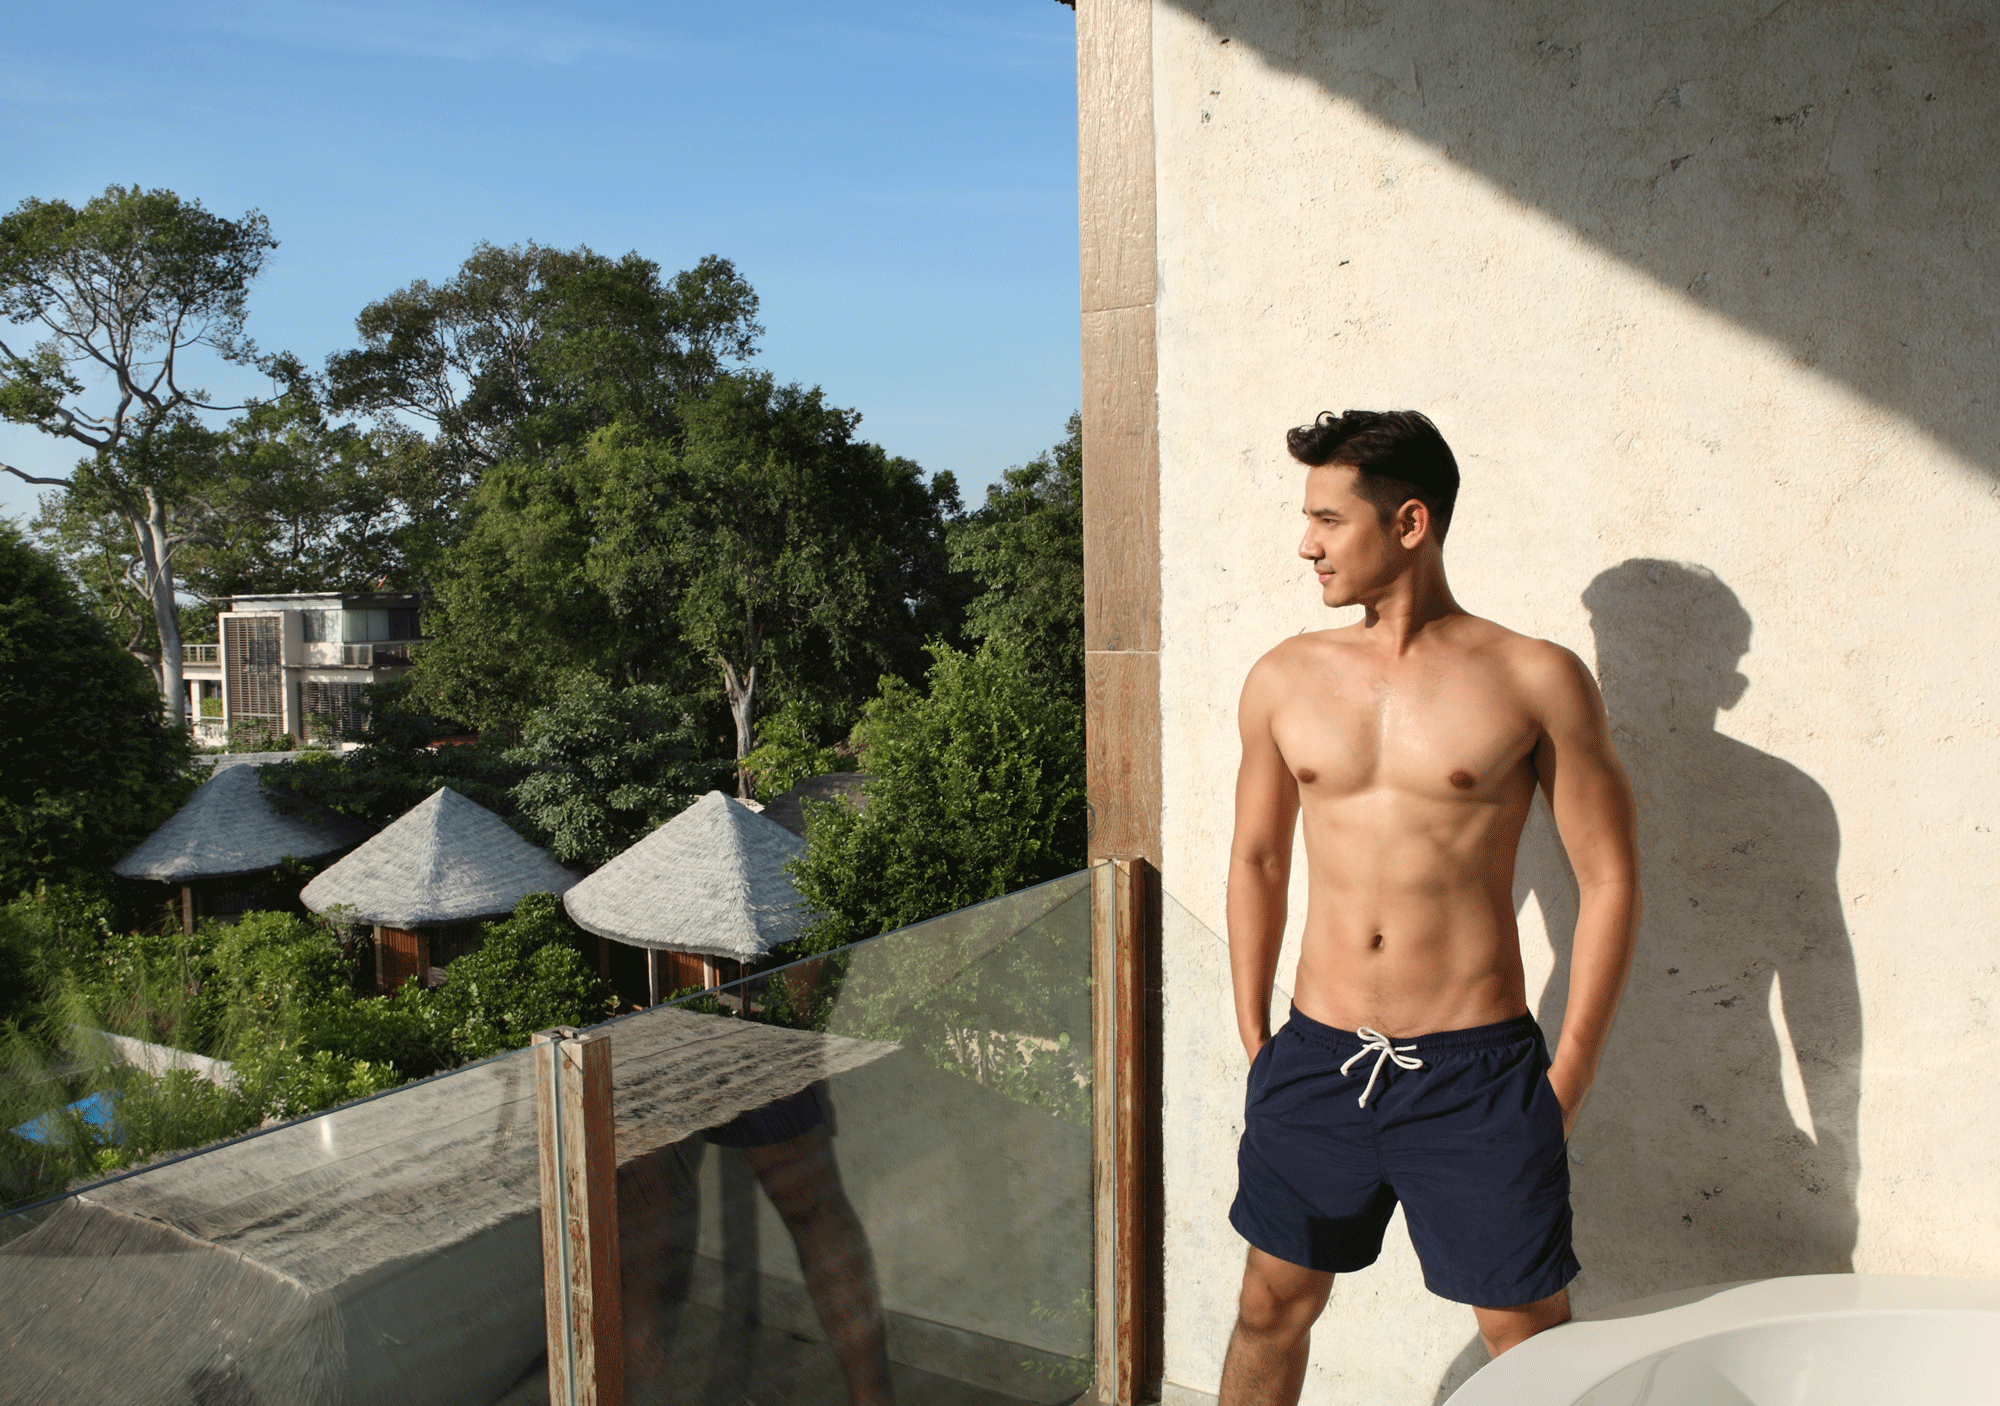 U PATTAYA  Photo : Tu Virapoj Asavajarn  Model : Ron Patarapon Too-Un @ron_patarapon  Location : U Pattaya  70/14, Ko Phai 12 Na Chom Thian 56 Alley, Bang Saray, Chang Wat, Chon Buri 20250, Thailand  Phone:+66 33 046 100    www.uhotelsresorts.com/ upattaya